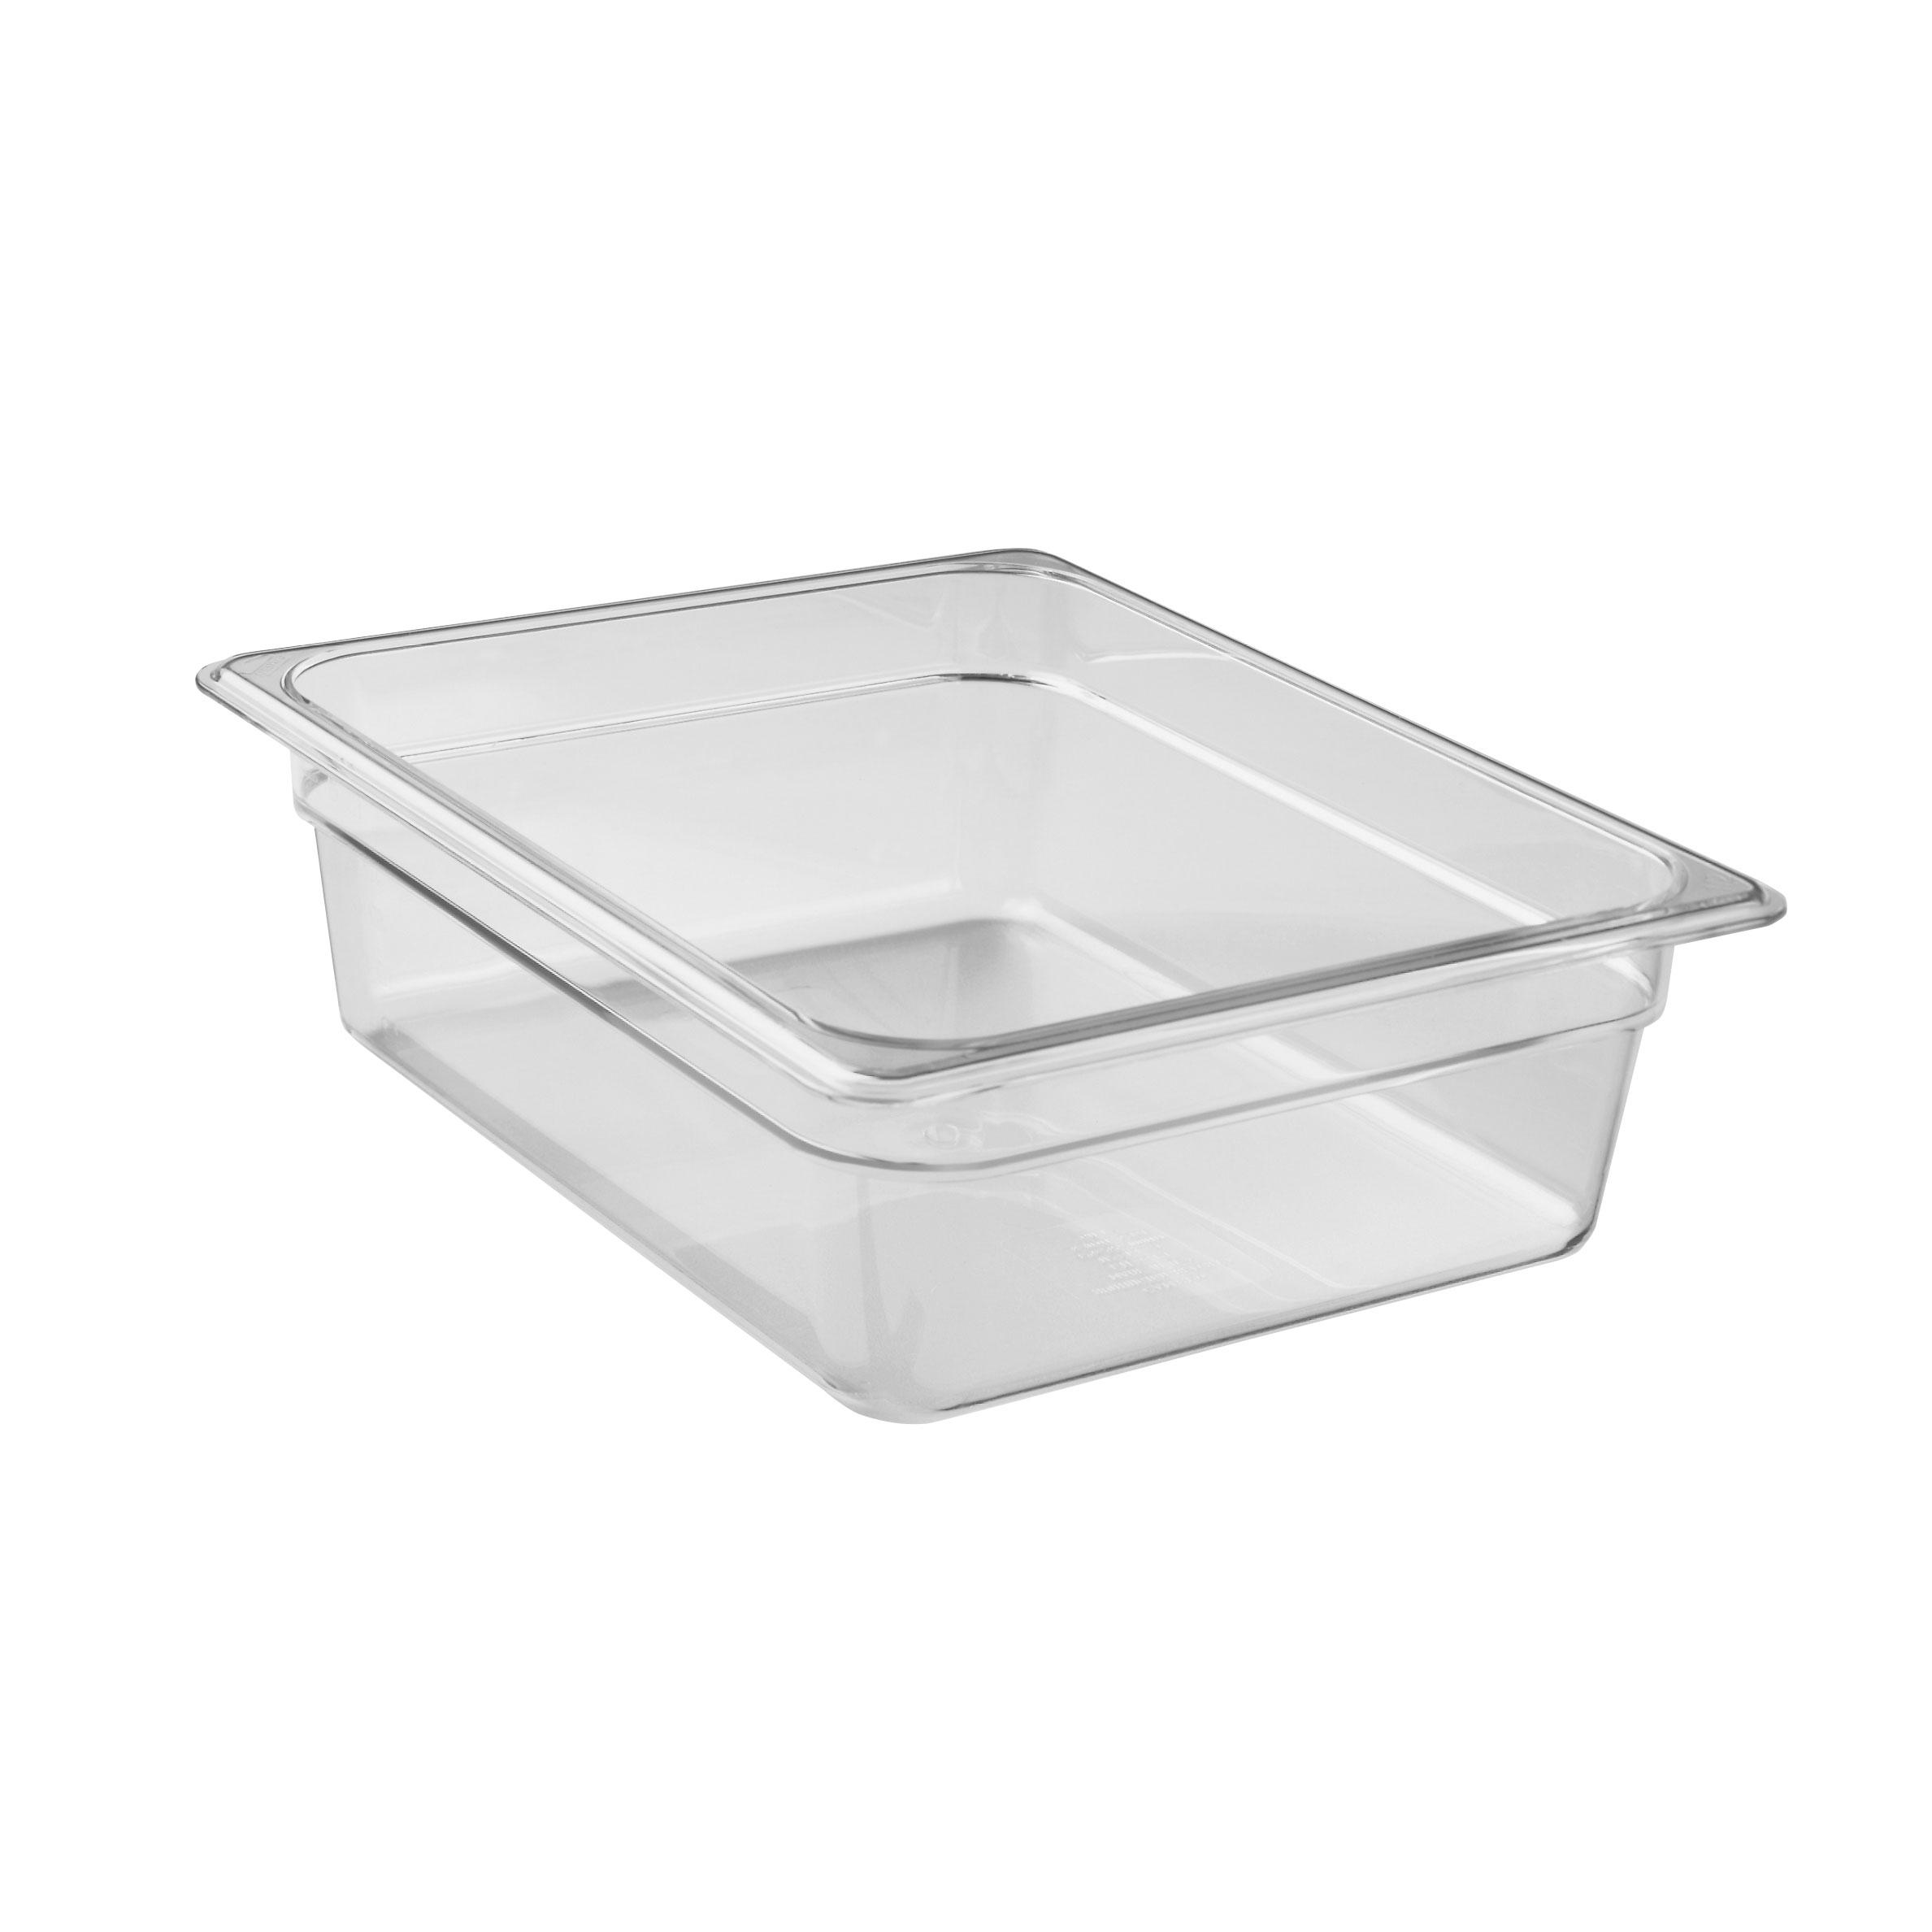 Cambro 24CW135 food/beverage storage container